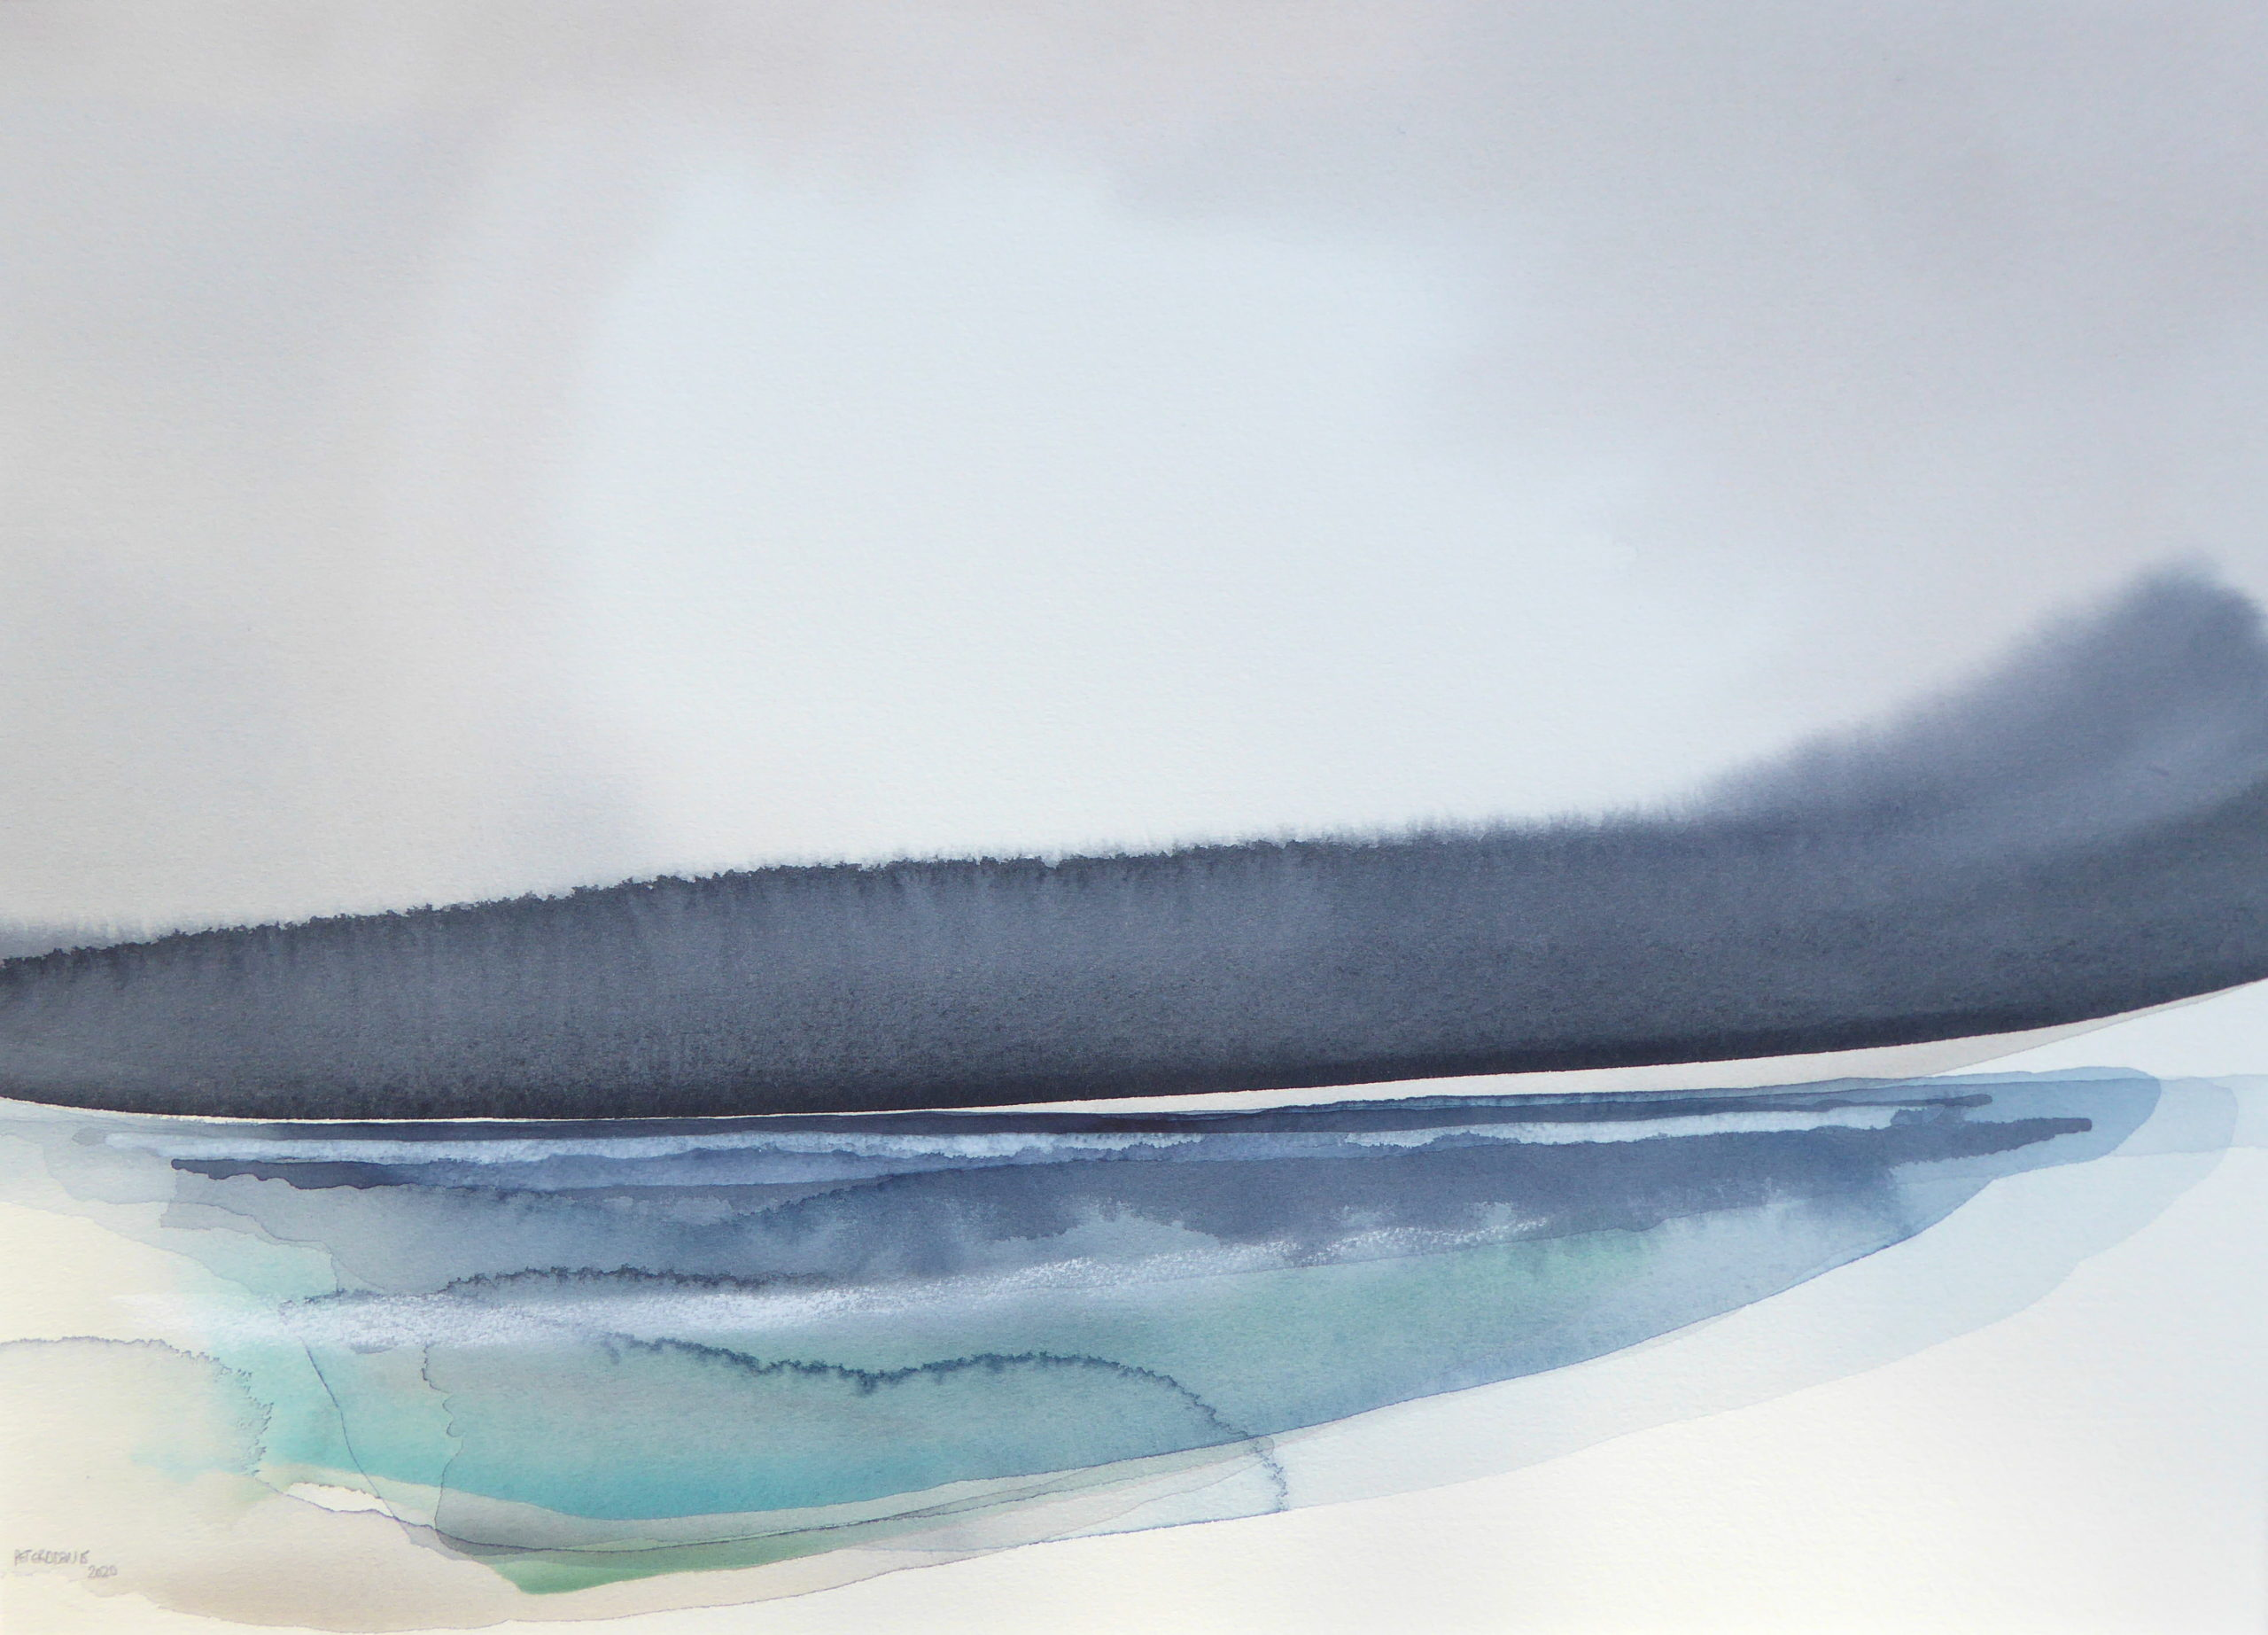 Peter Davis. Tirl approaching, Watercolour on paper 2020 (50x70cm)